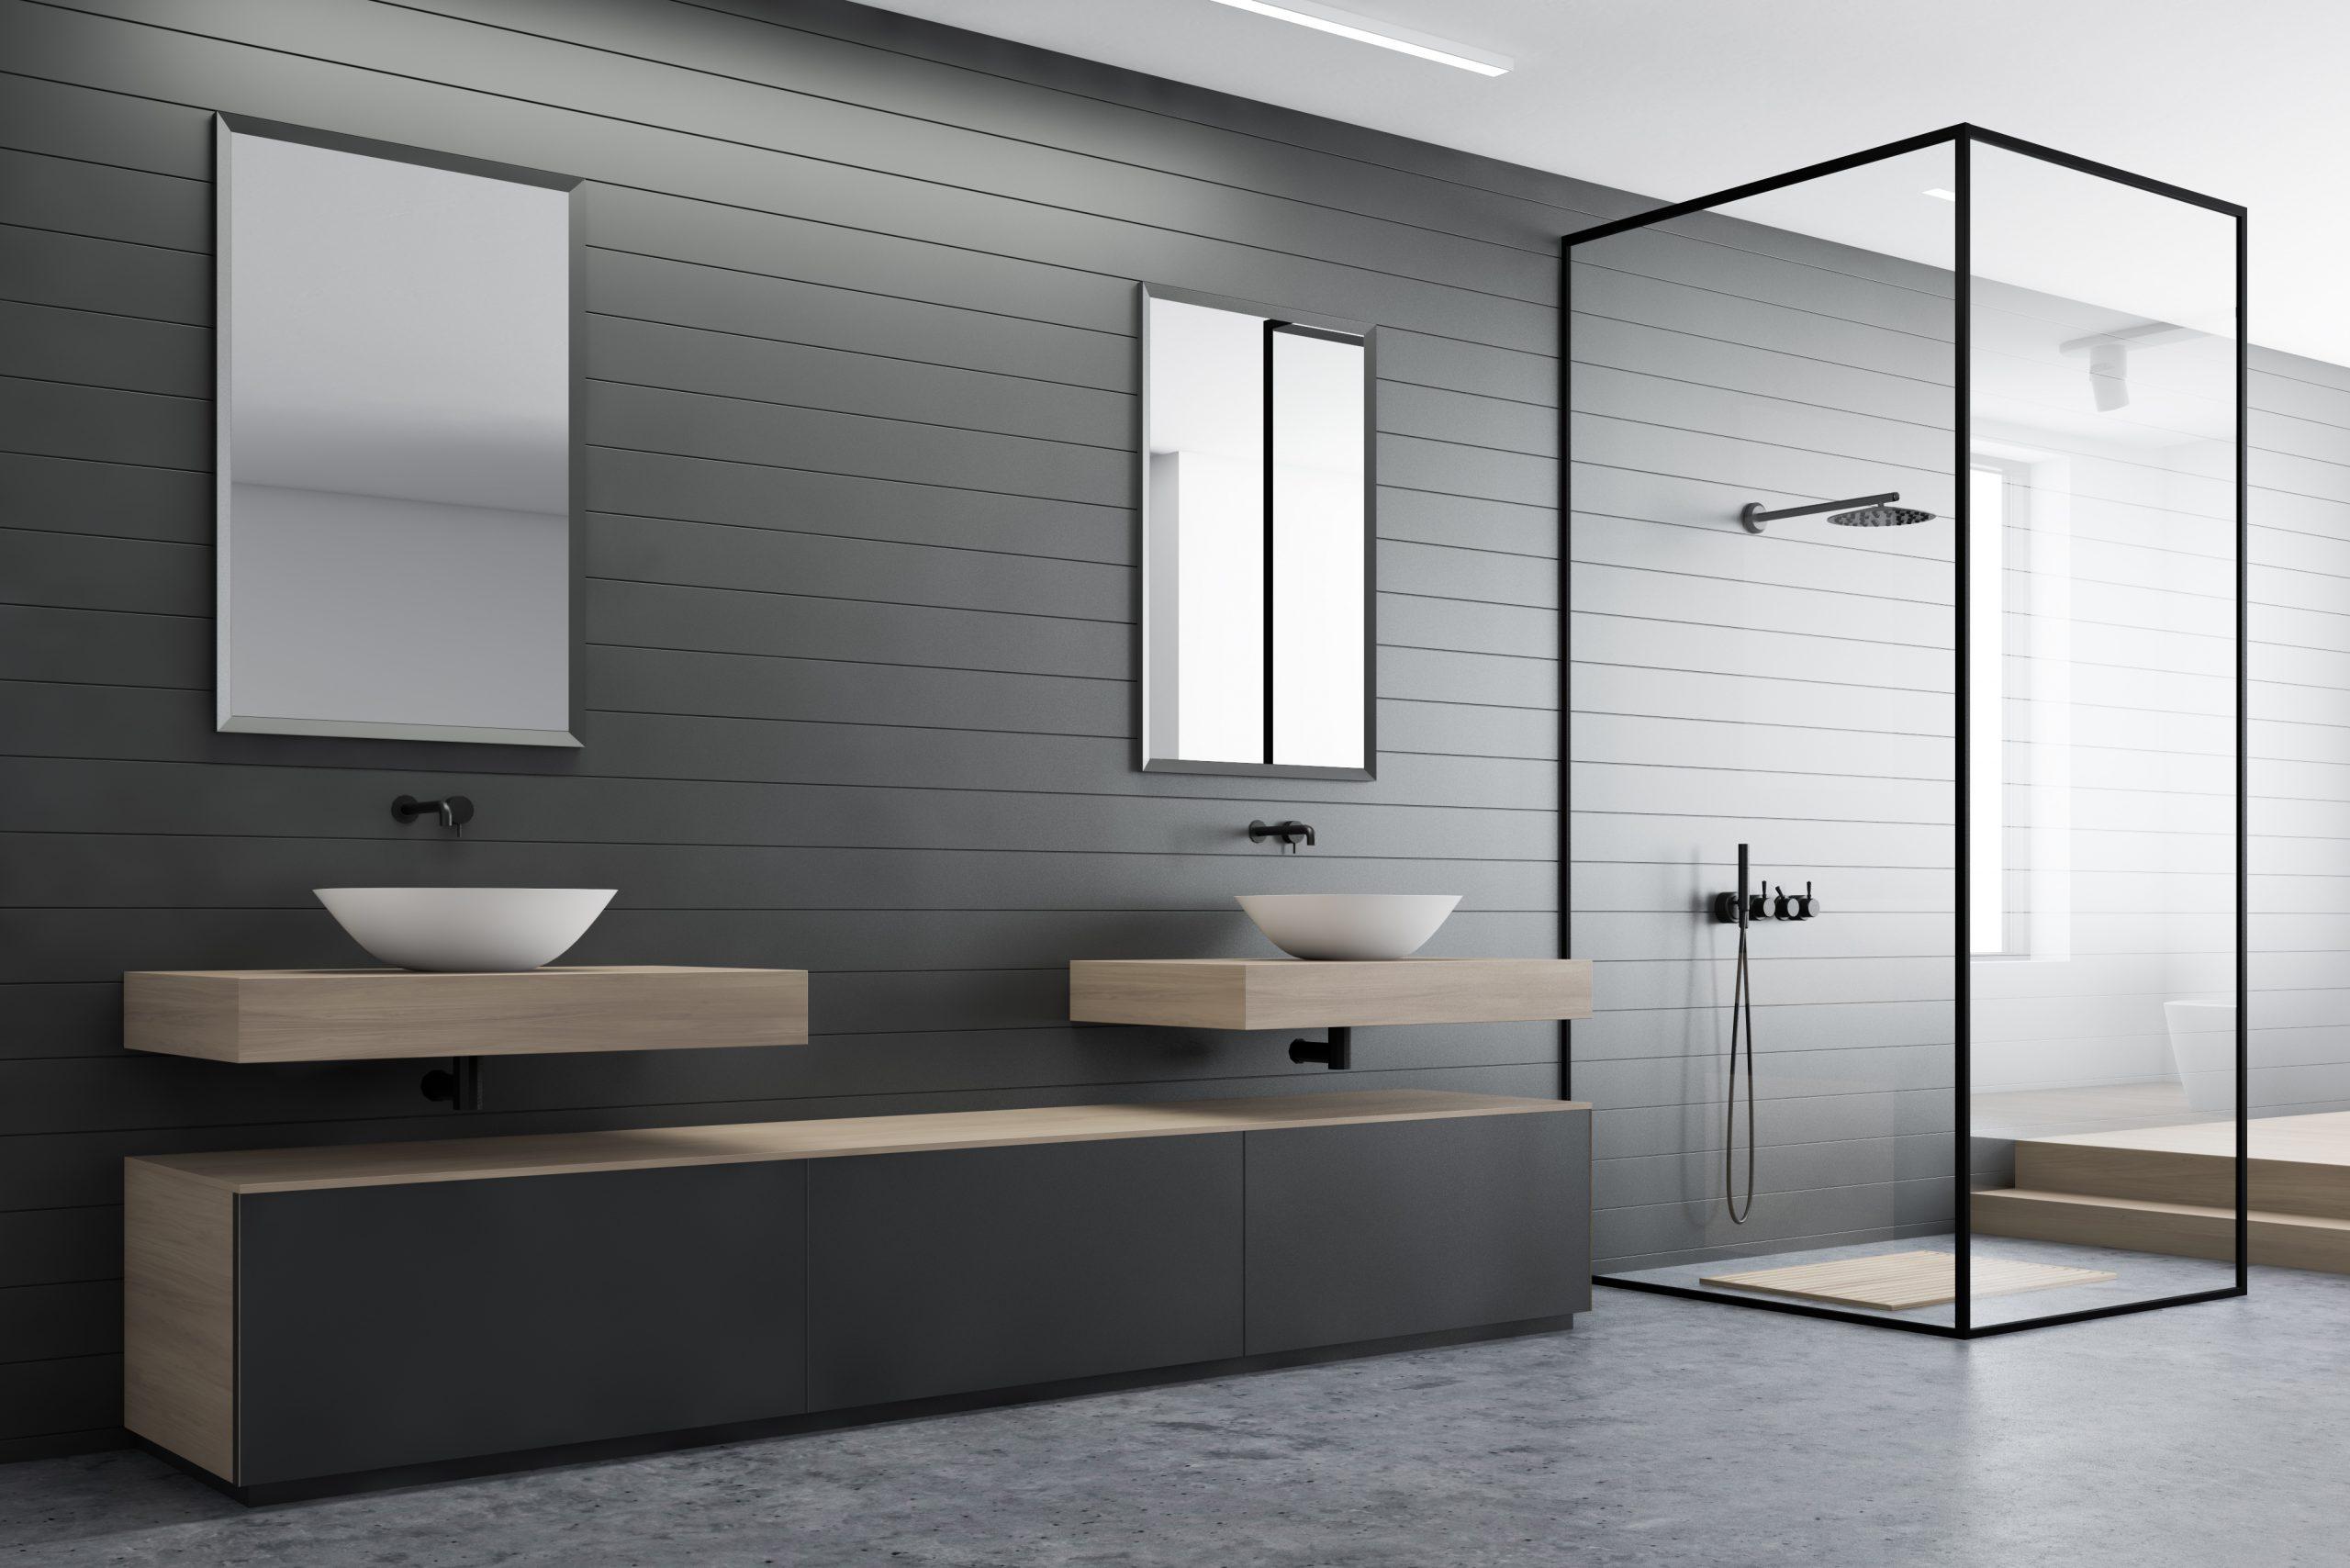 Darwin bathroom renovation